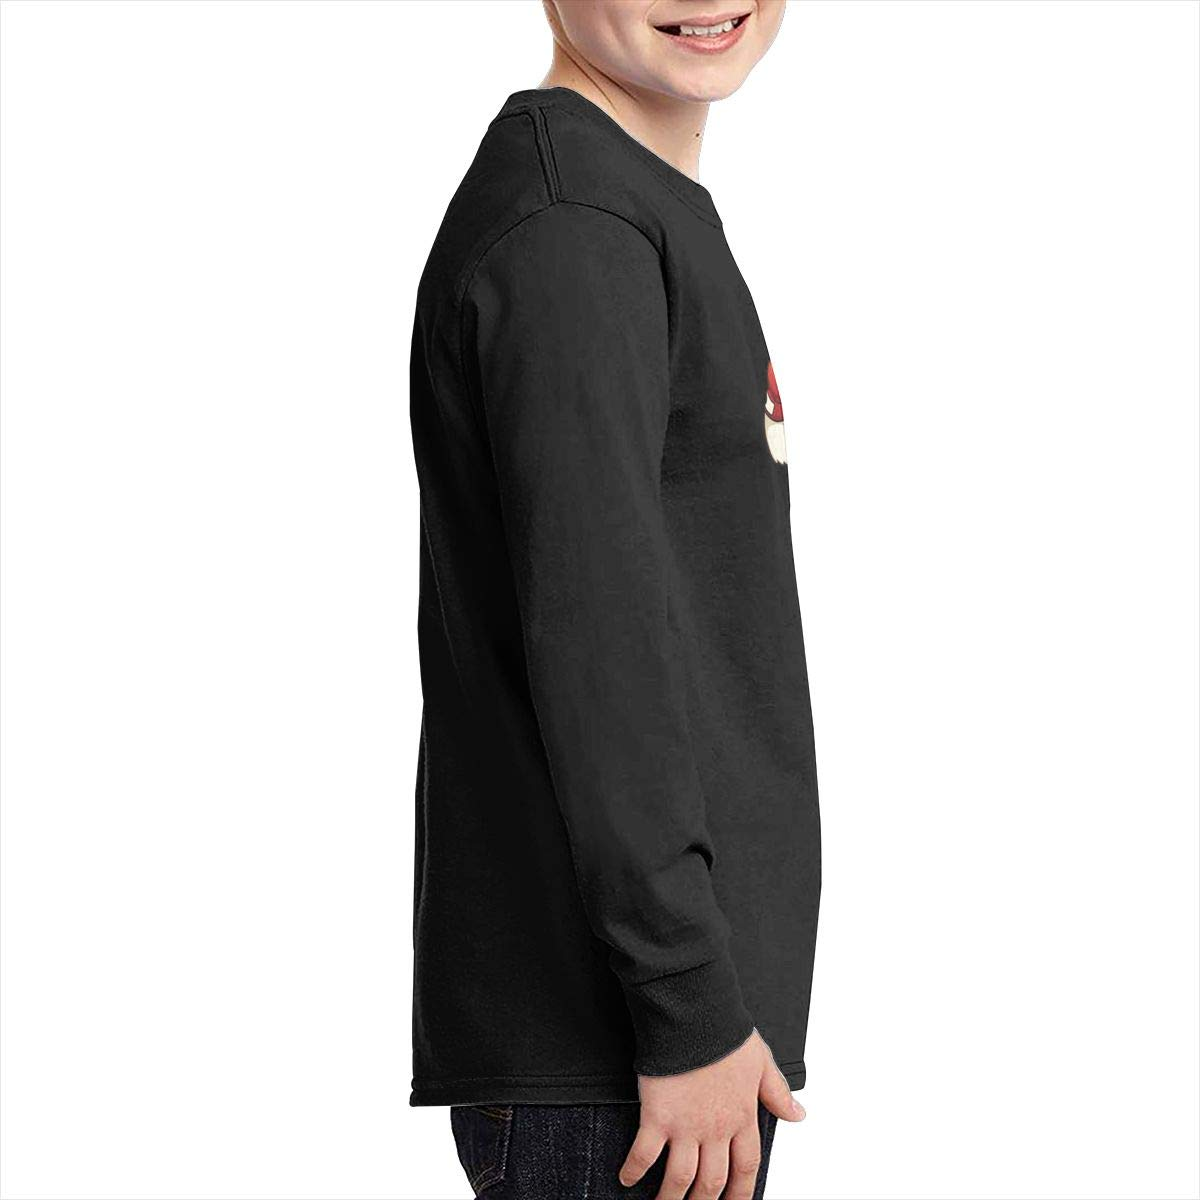 Funny Boxing Rooster Teen Boy Girl Sport Pullover Sweatshirt Novelty Shirt